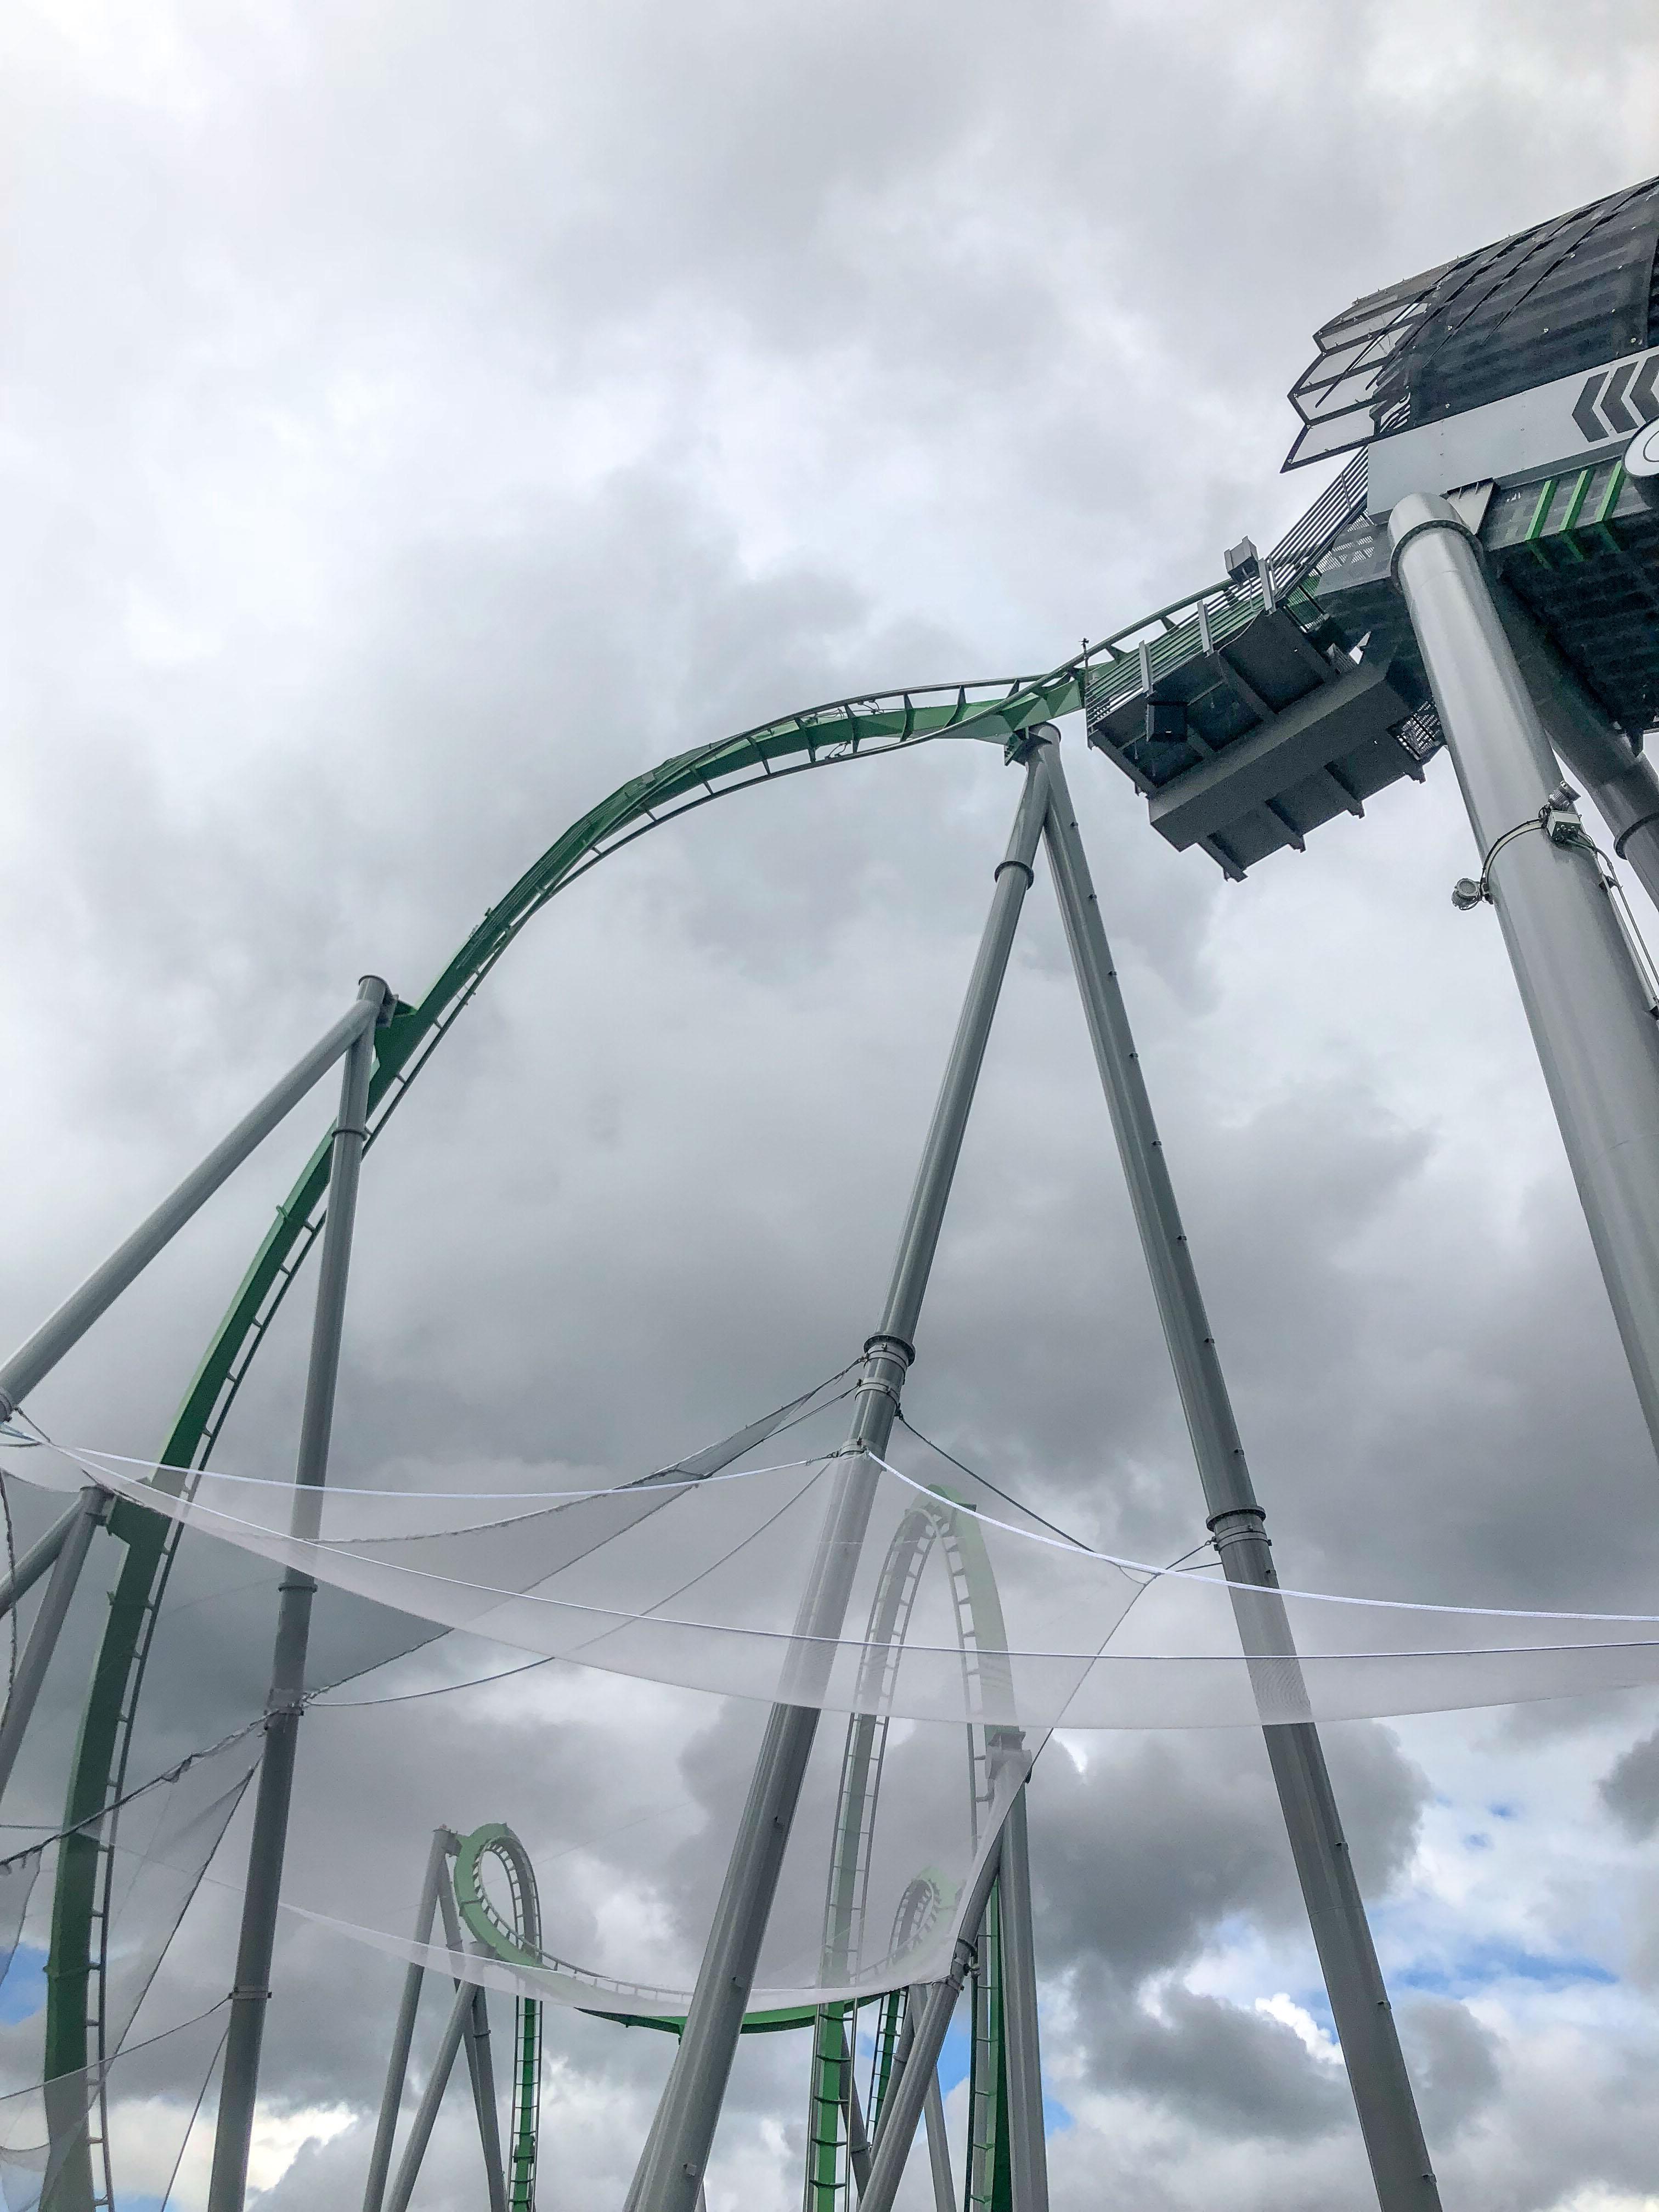 The Incredible Hulk Coaster Universal Islands Adventure Orlando